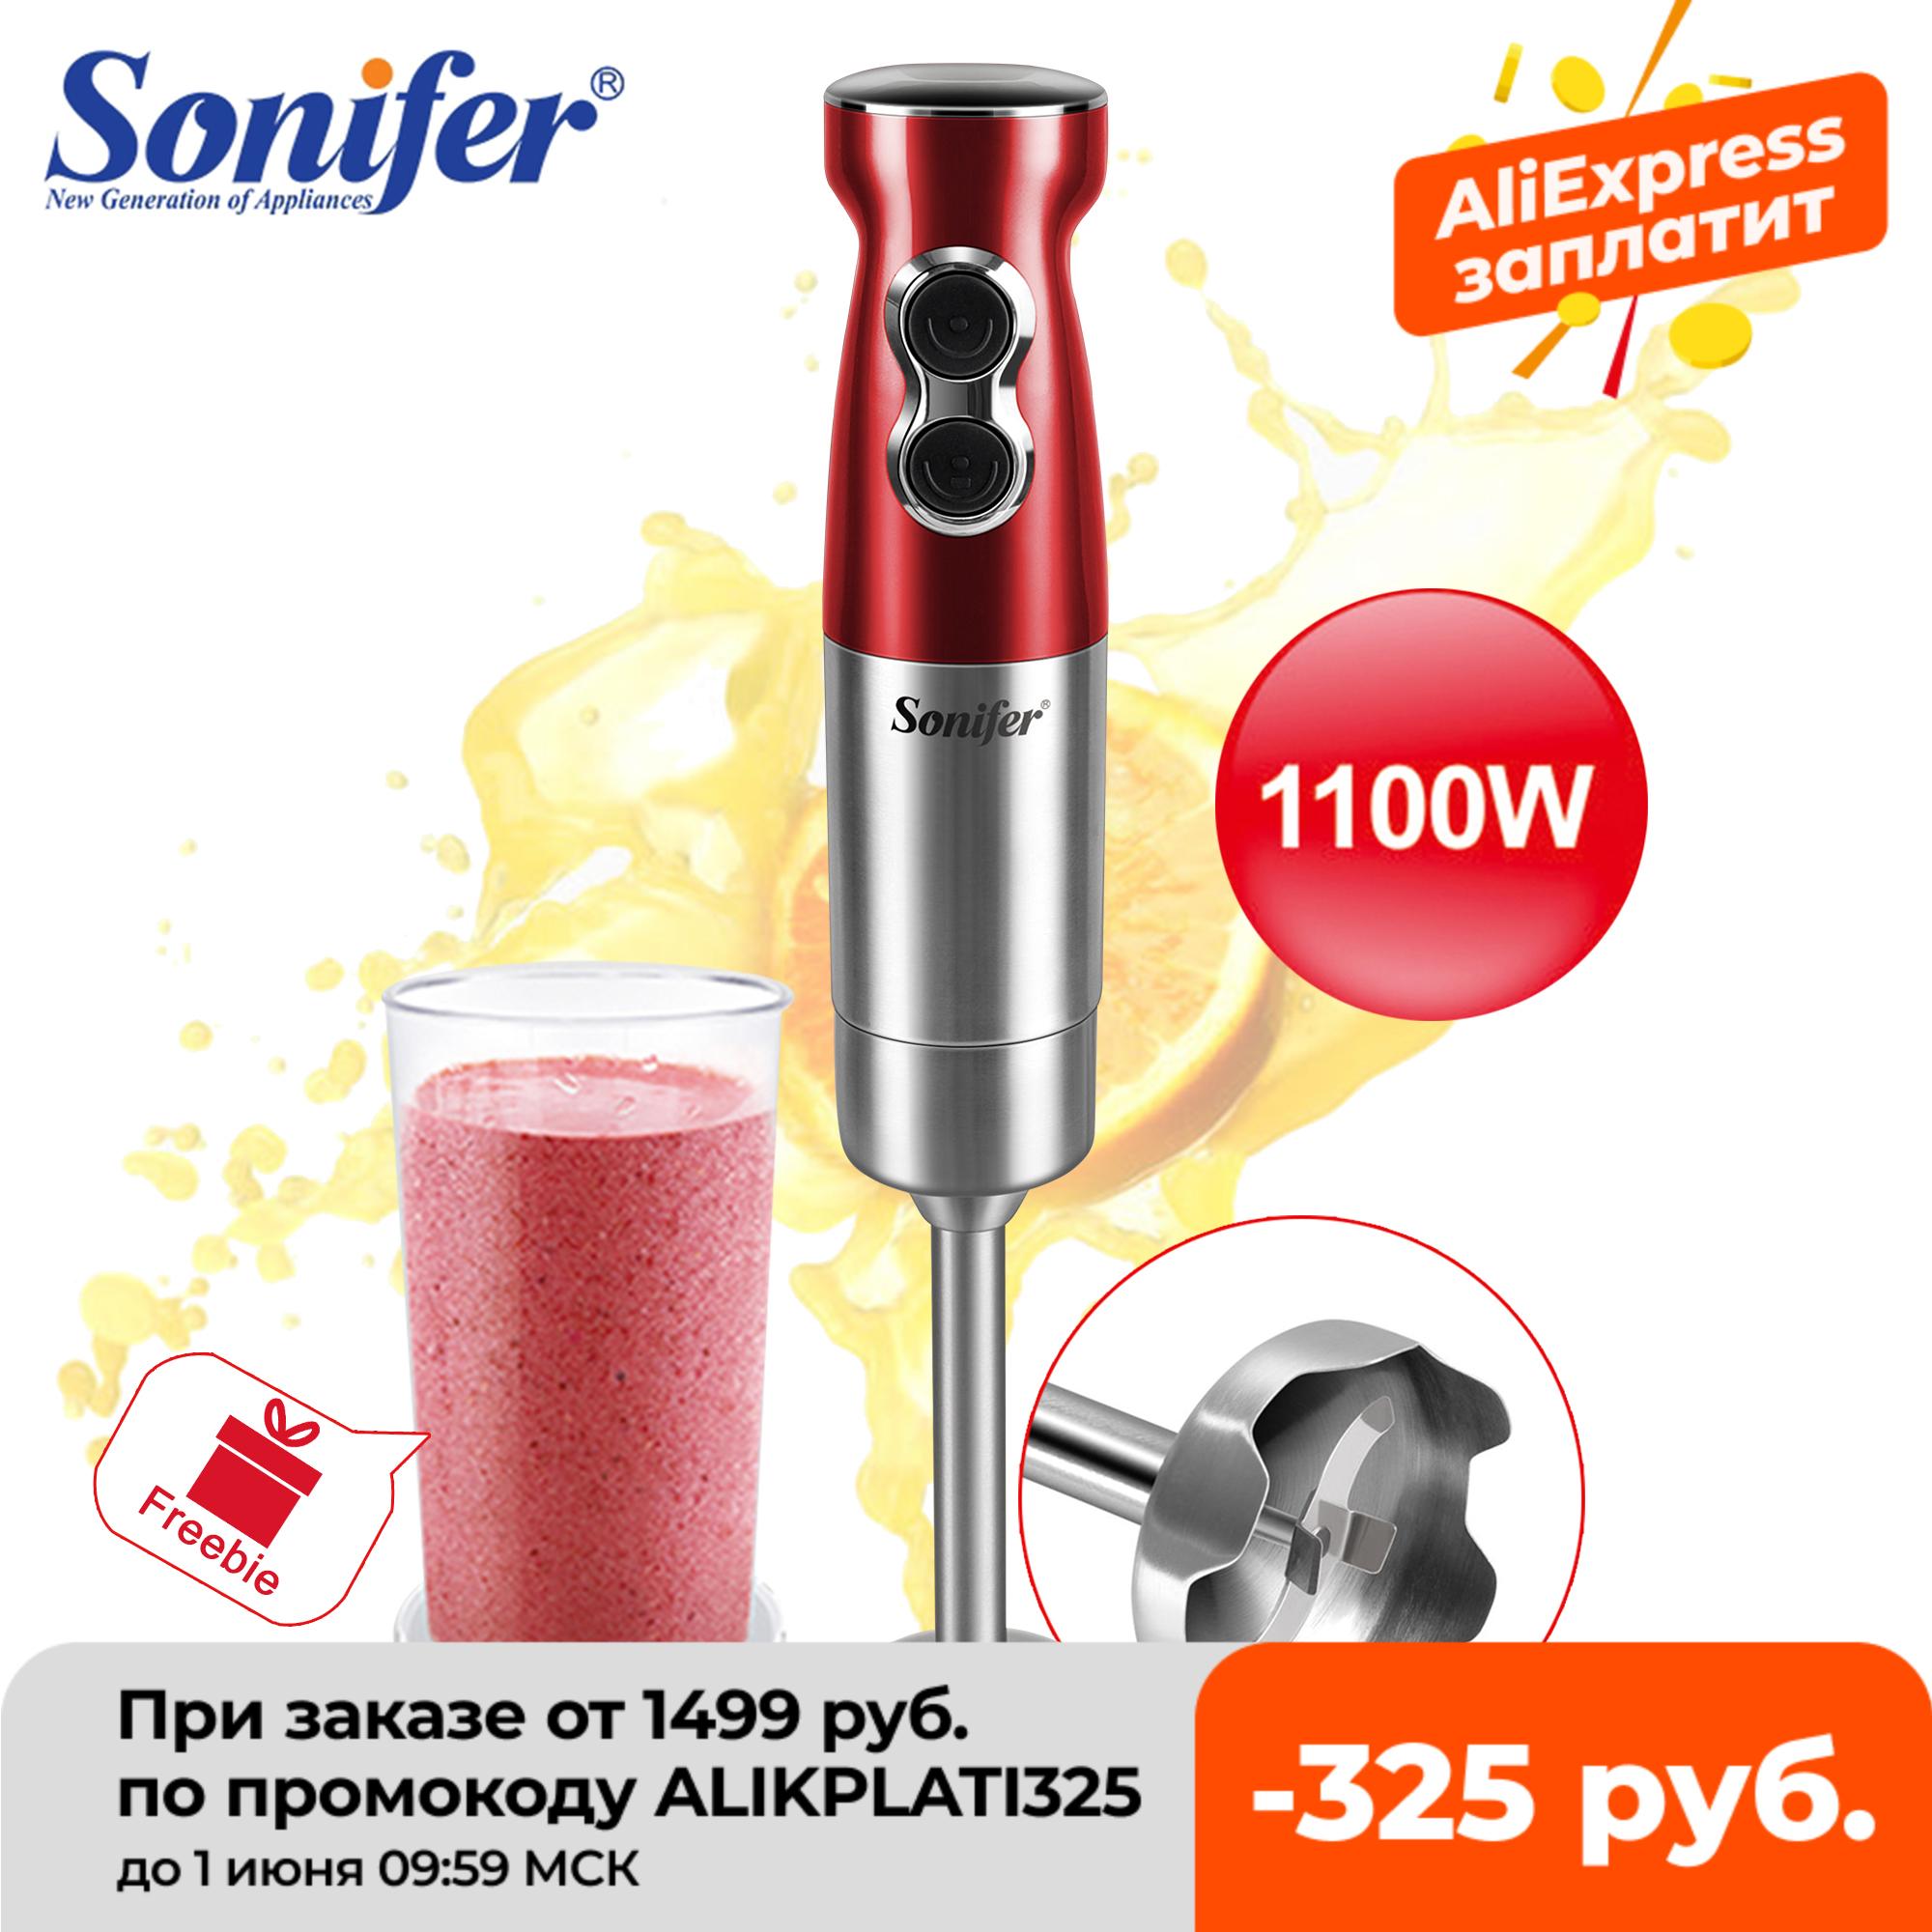 1100W High Power Food Mixer 2 Speeds Hand Blender Electric Four blade Ice Crushing Kitchen Vegetable Fruit Stirring Gift Sonifer